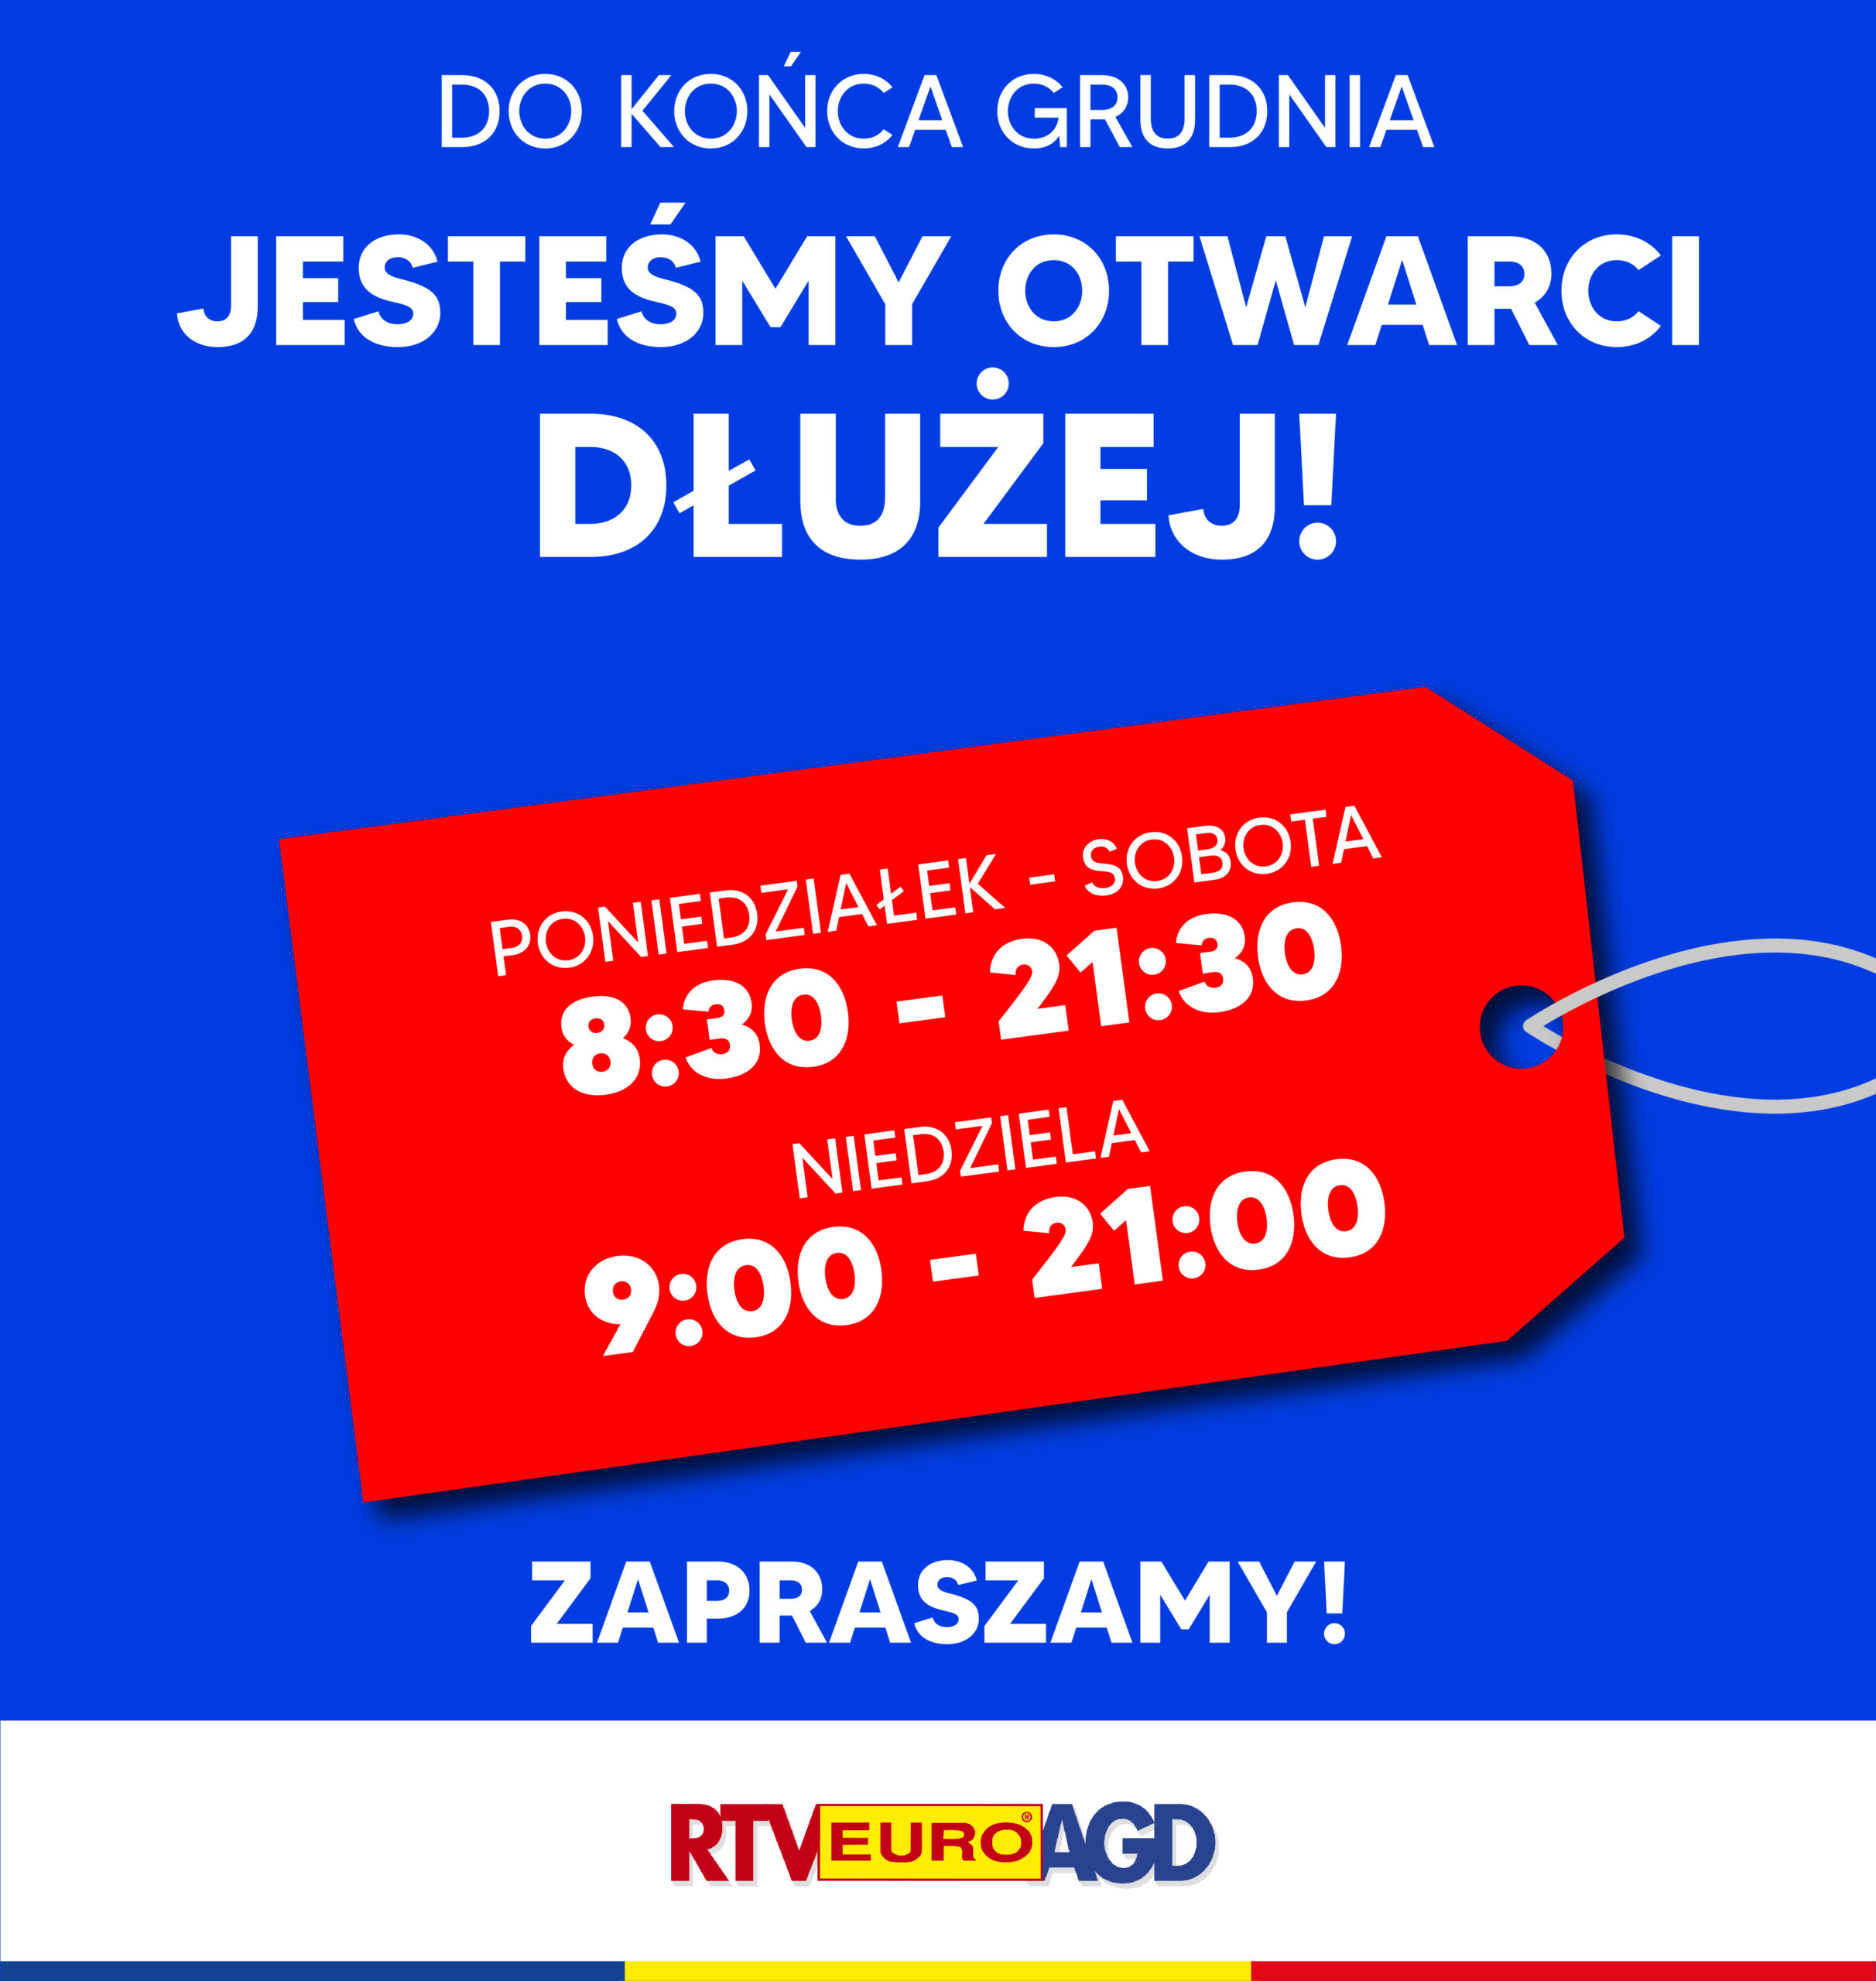 RTV EURO AGD, piętro